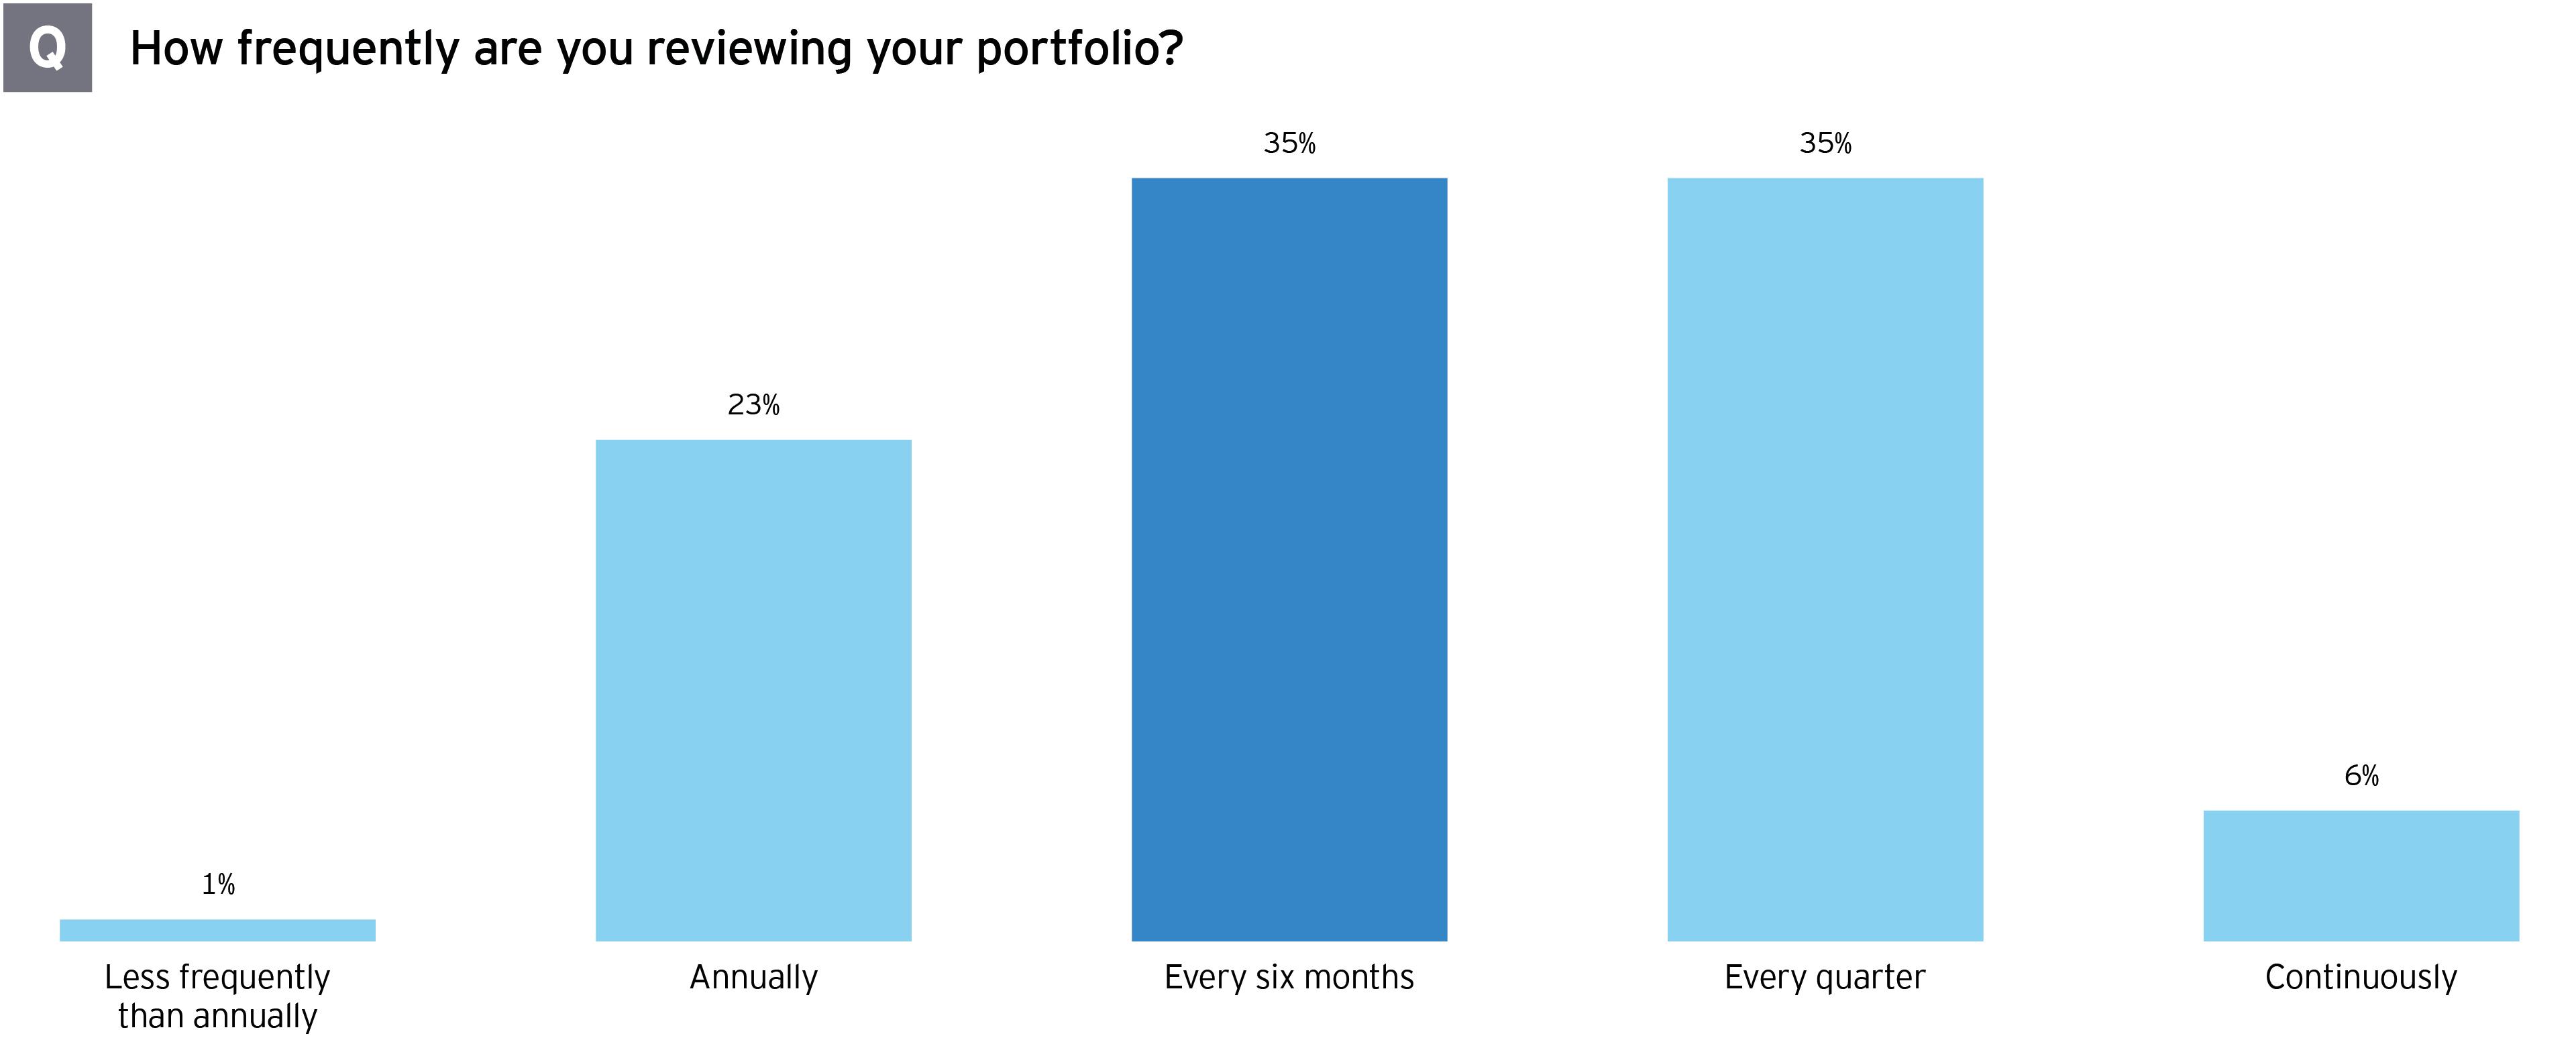 Oil & gas portfolio